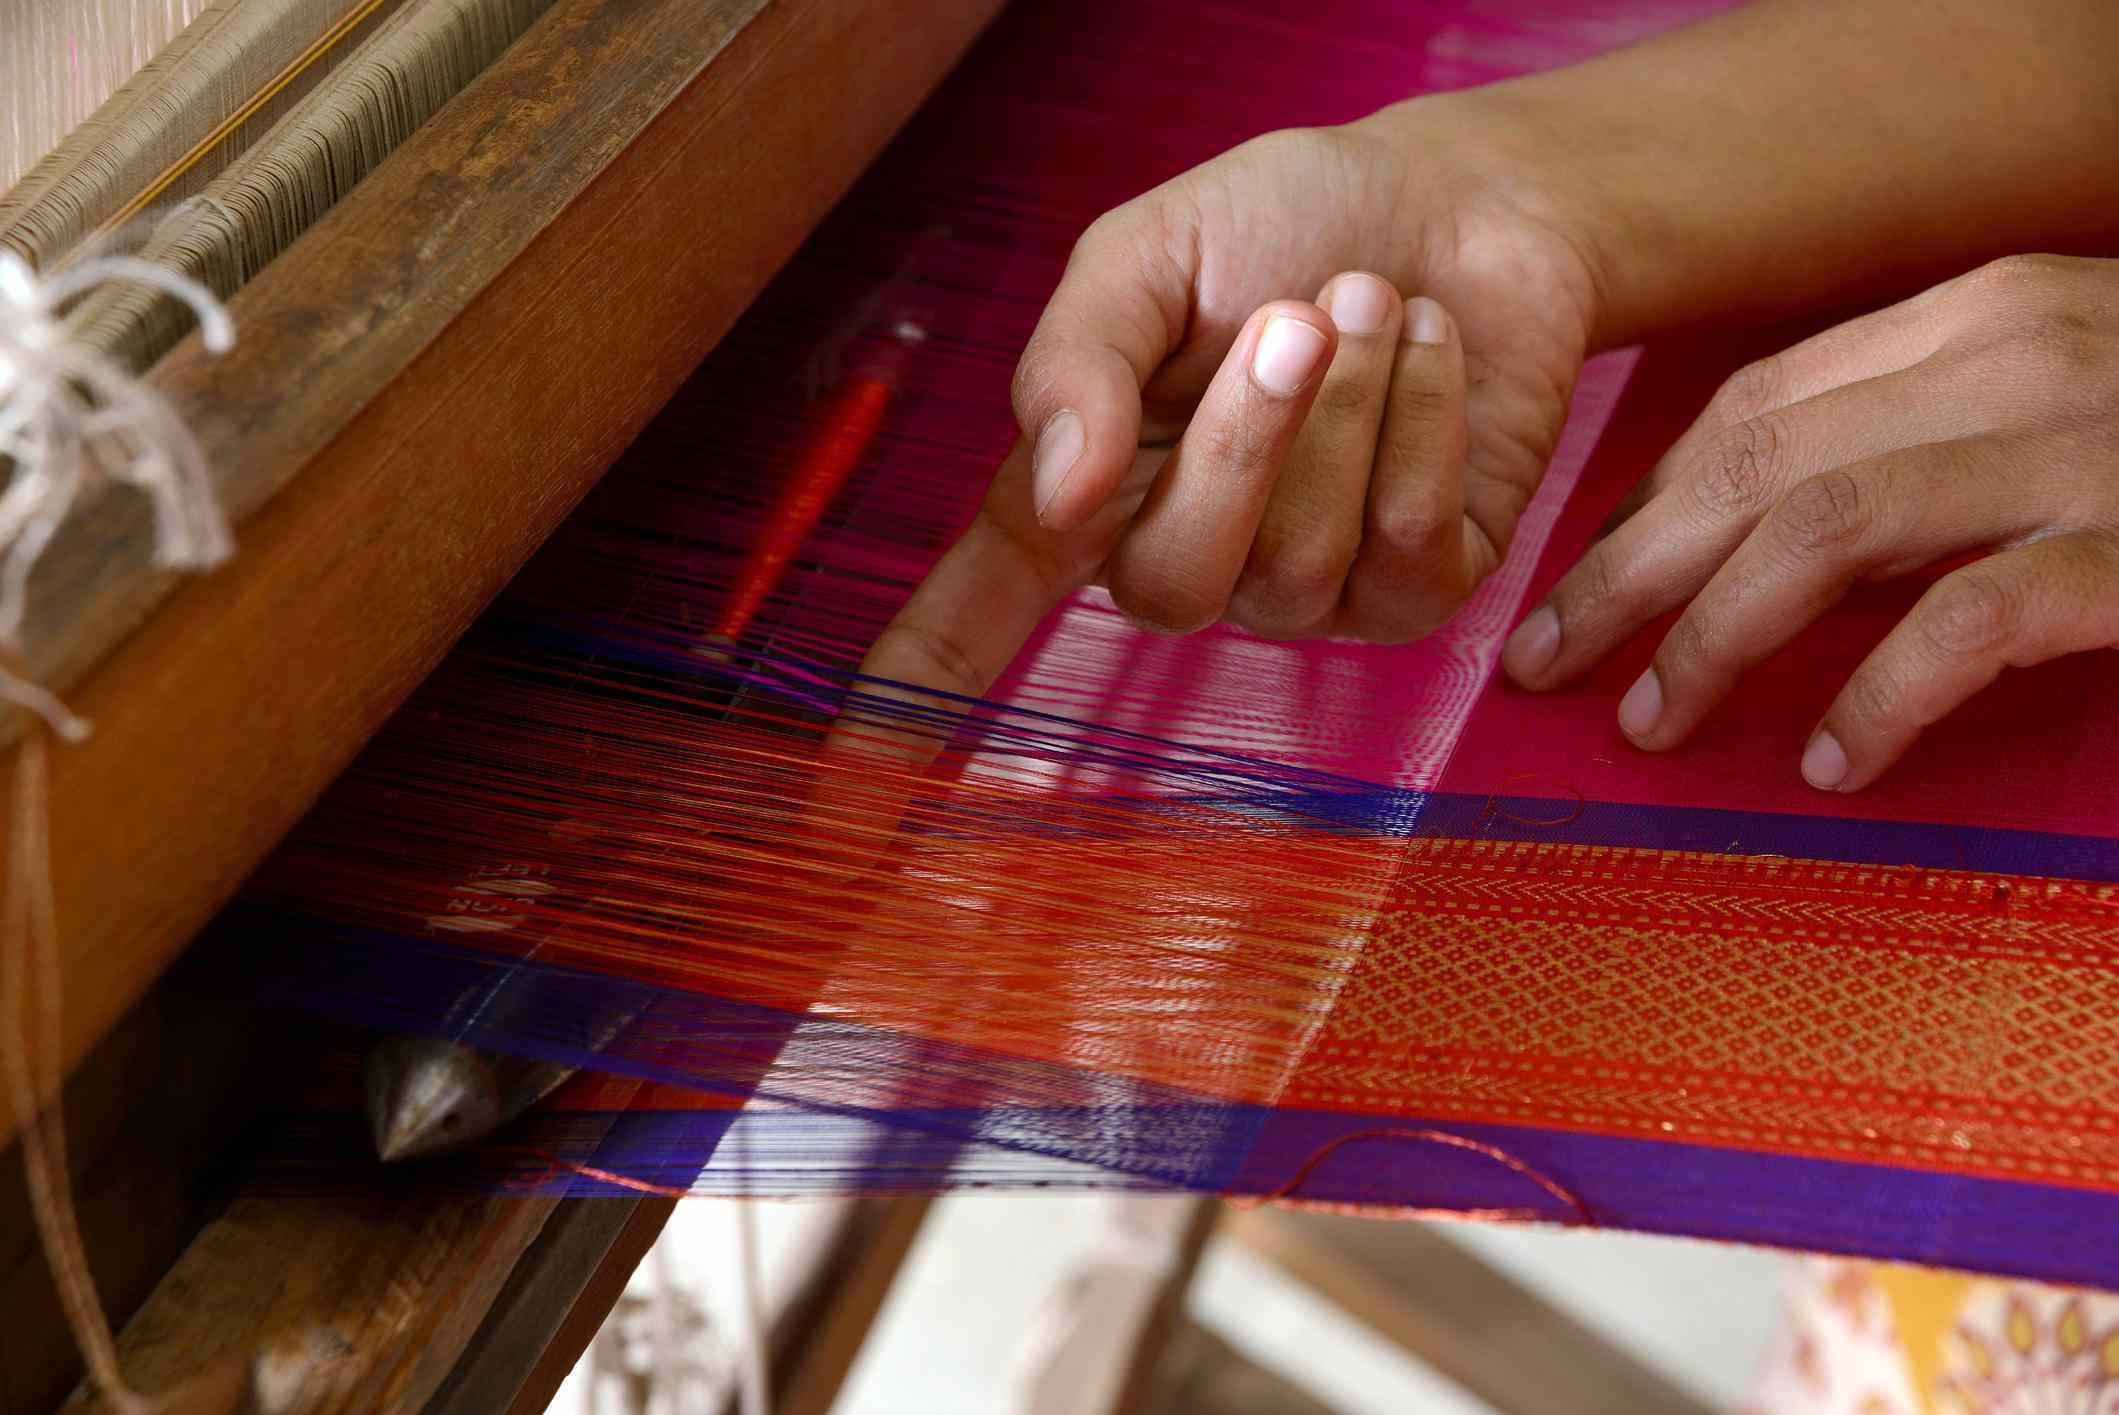 Weaving a sari in India.